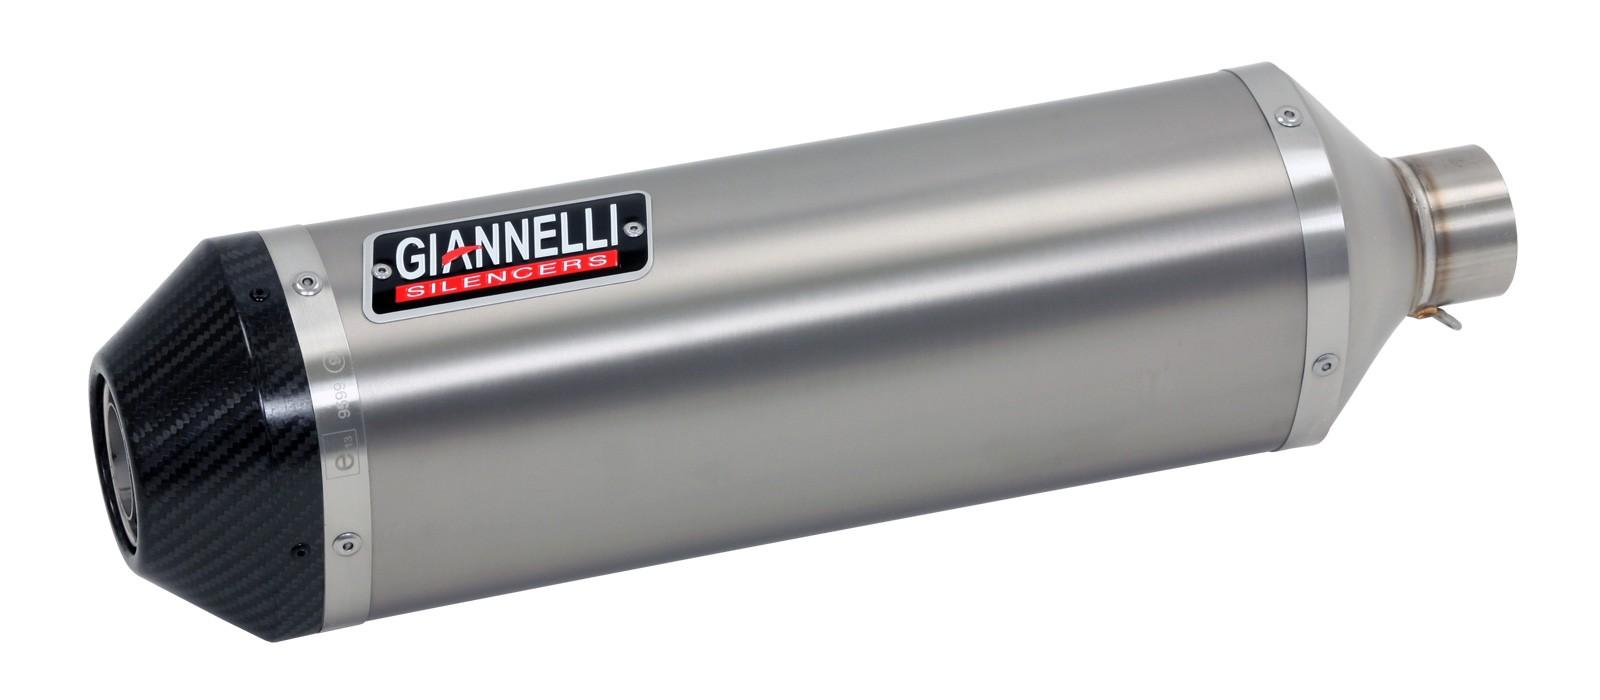 ESCAPES GIANNELLI BMW - Sistema completo IPERSPORT Silenciador titanio con terminación carbono BMW S 1000 RR Giannelli 7